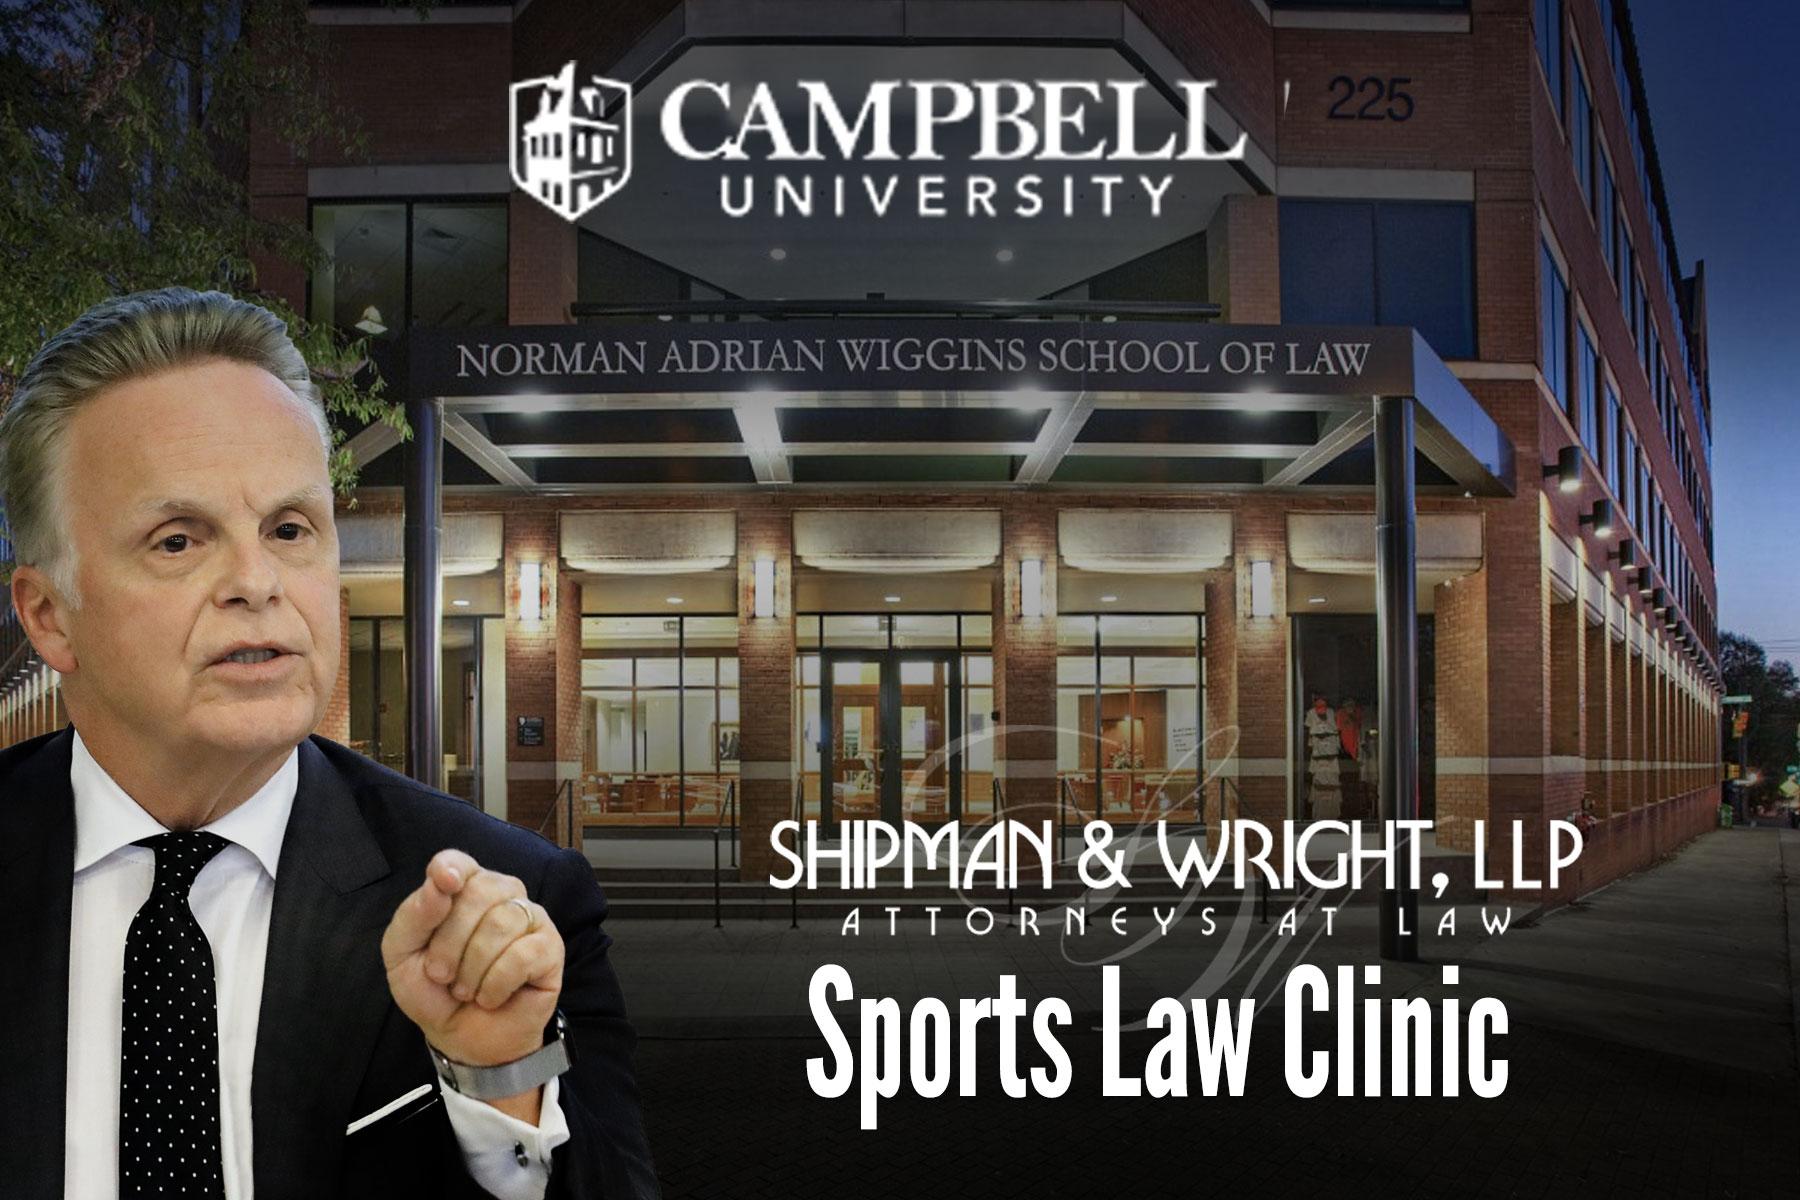 Shipman & Wright Sports Law Clinic